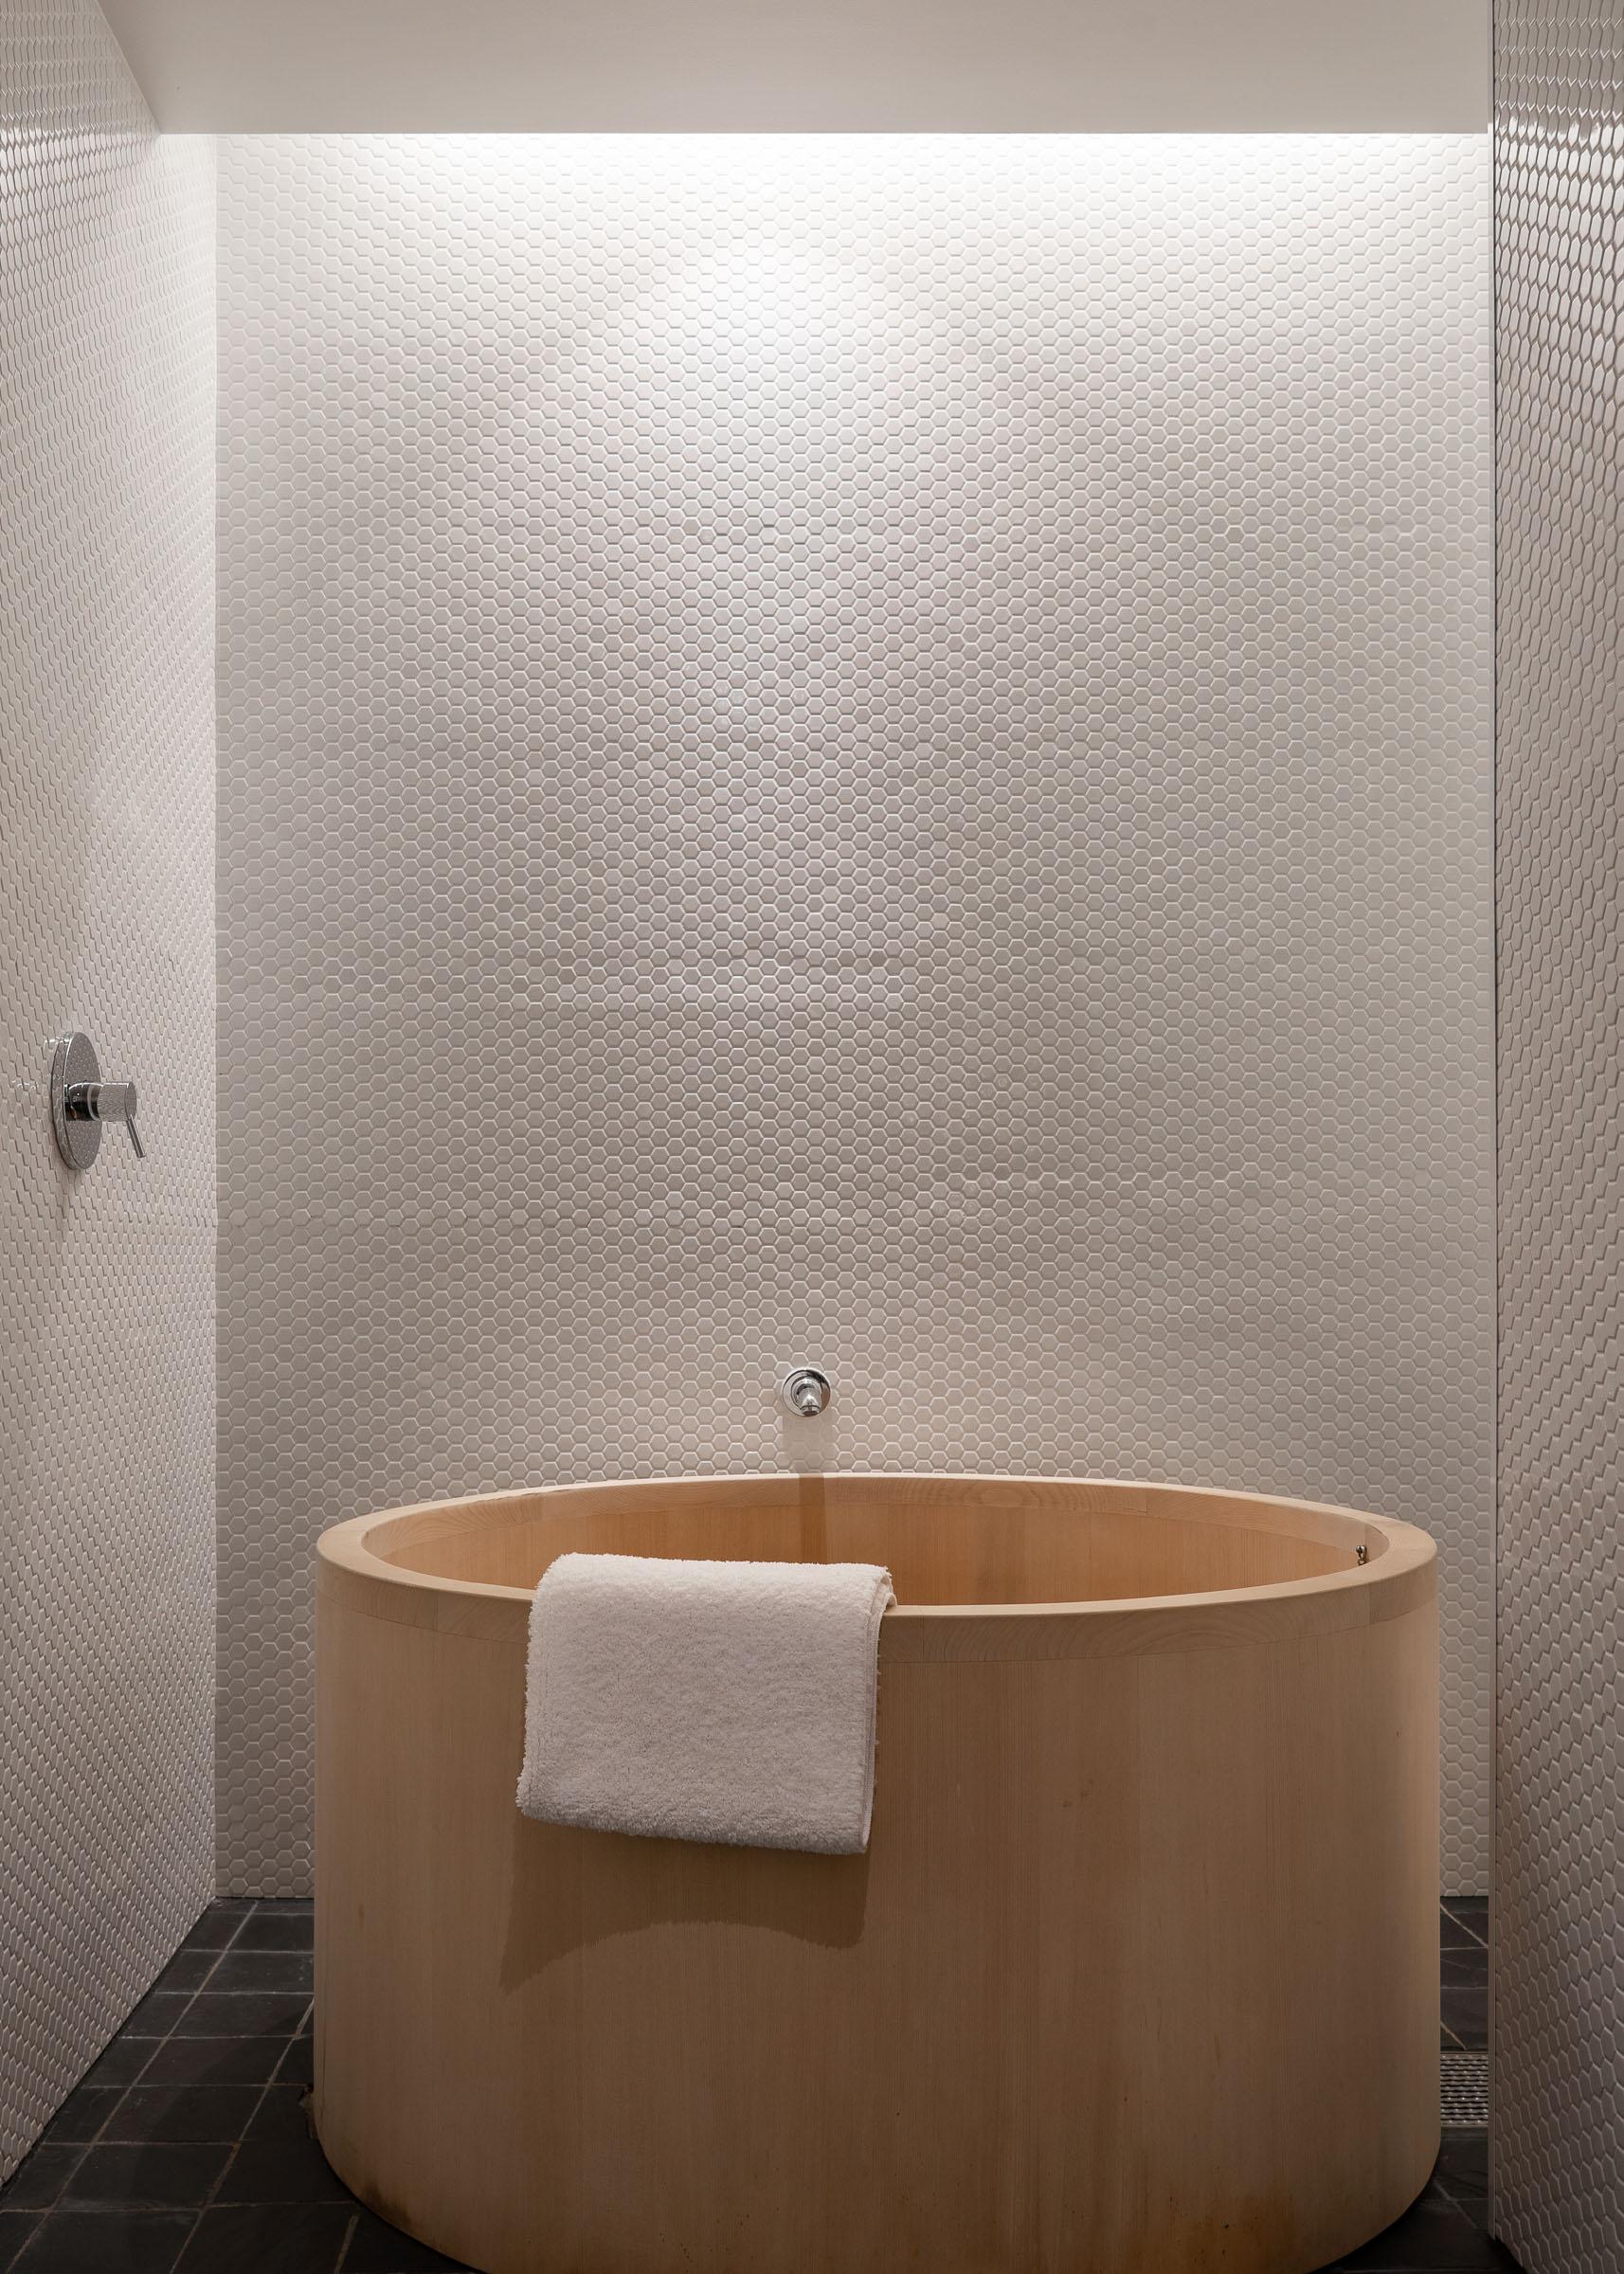 Hotel Kanra Kyoto Review — Modern Design Hotel Kyoto Japan — Softer Volumes